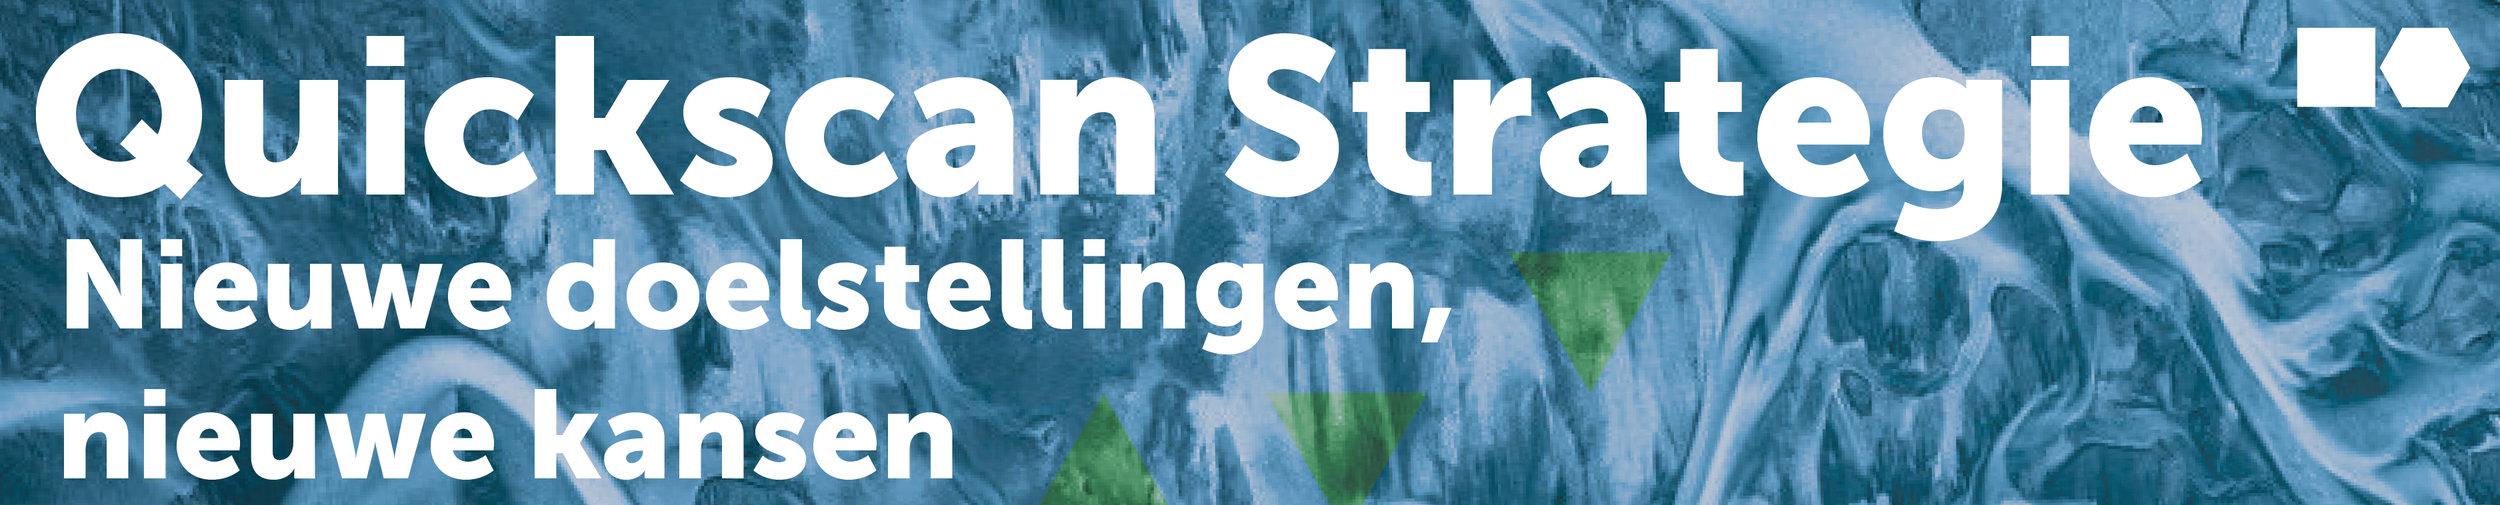 Banner-web7.jpg